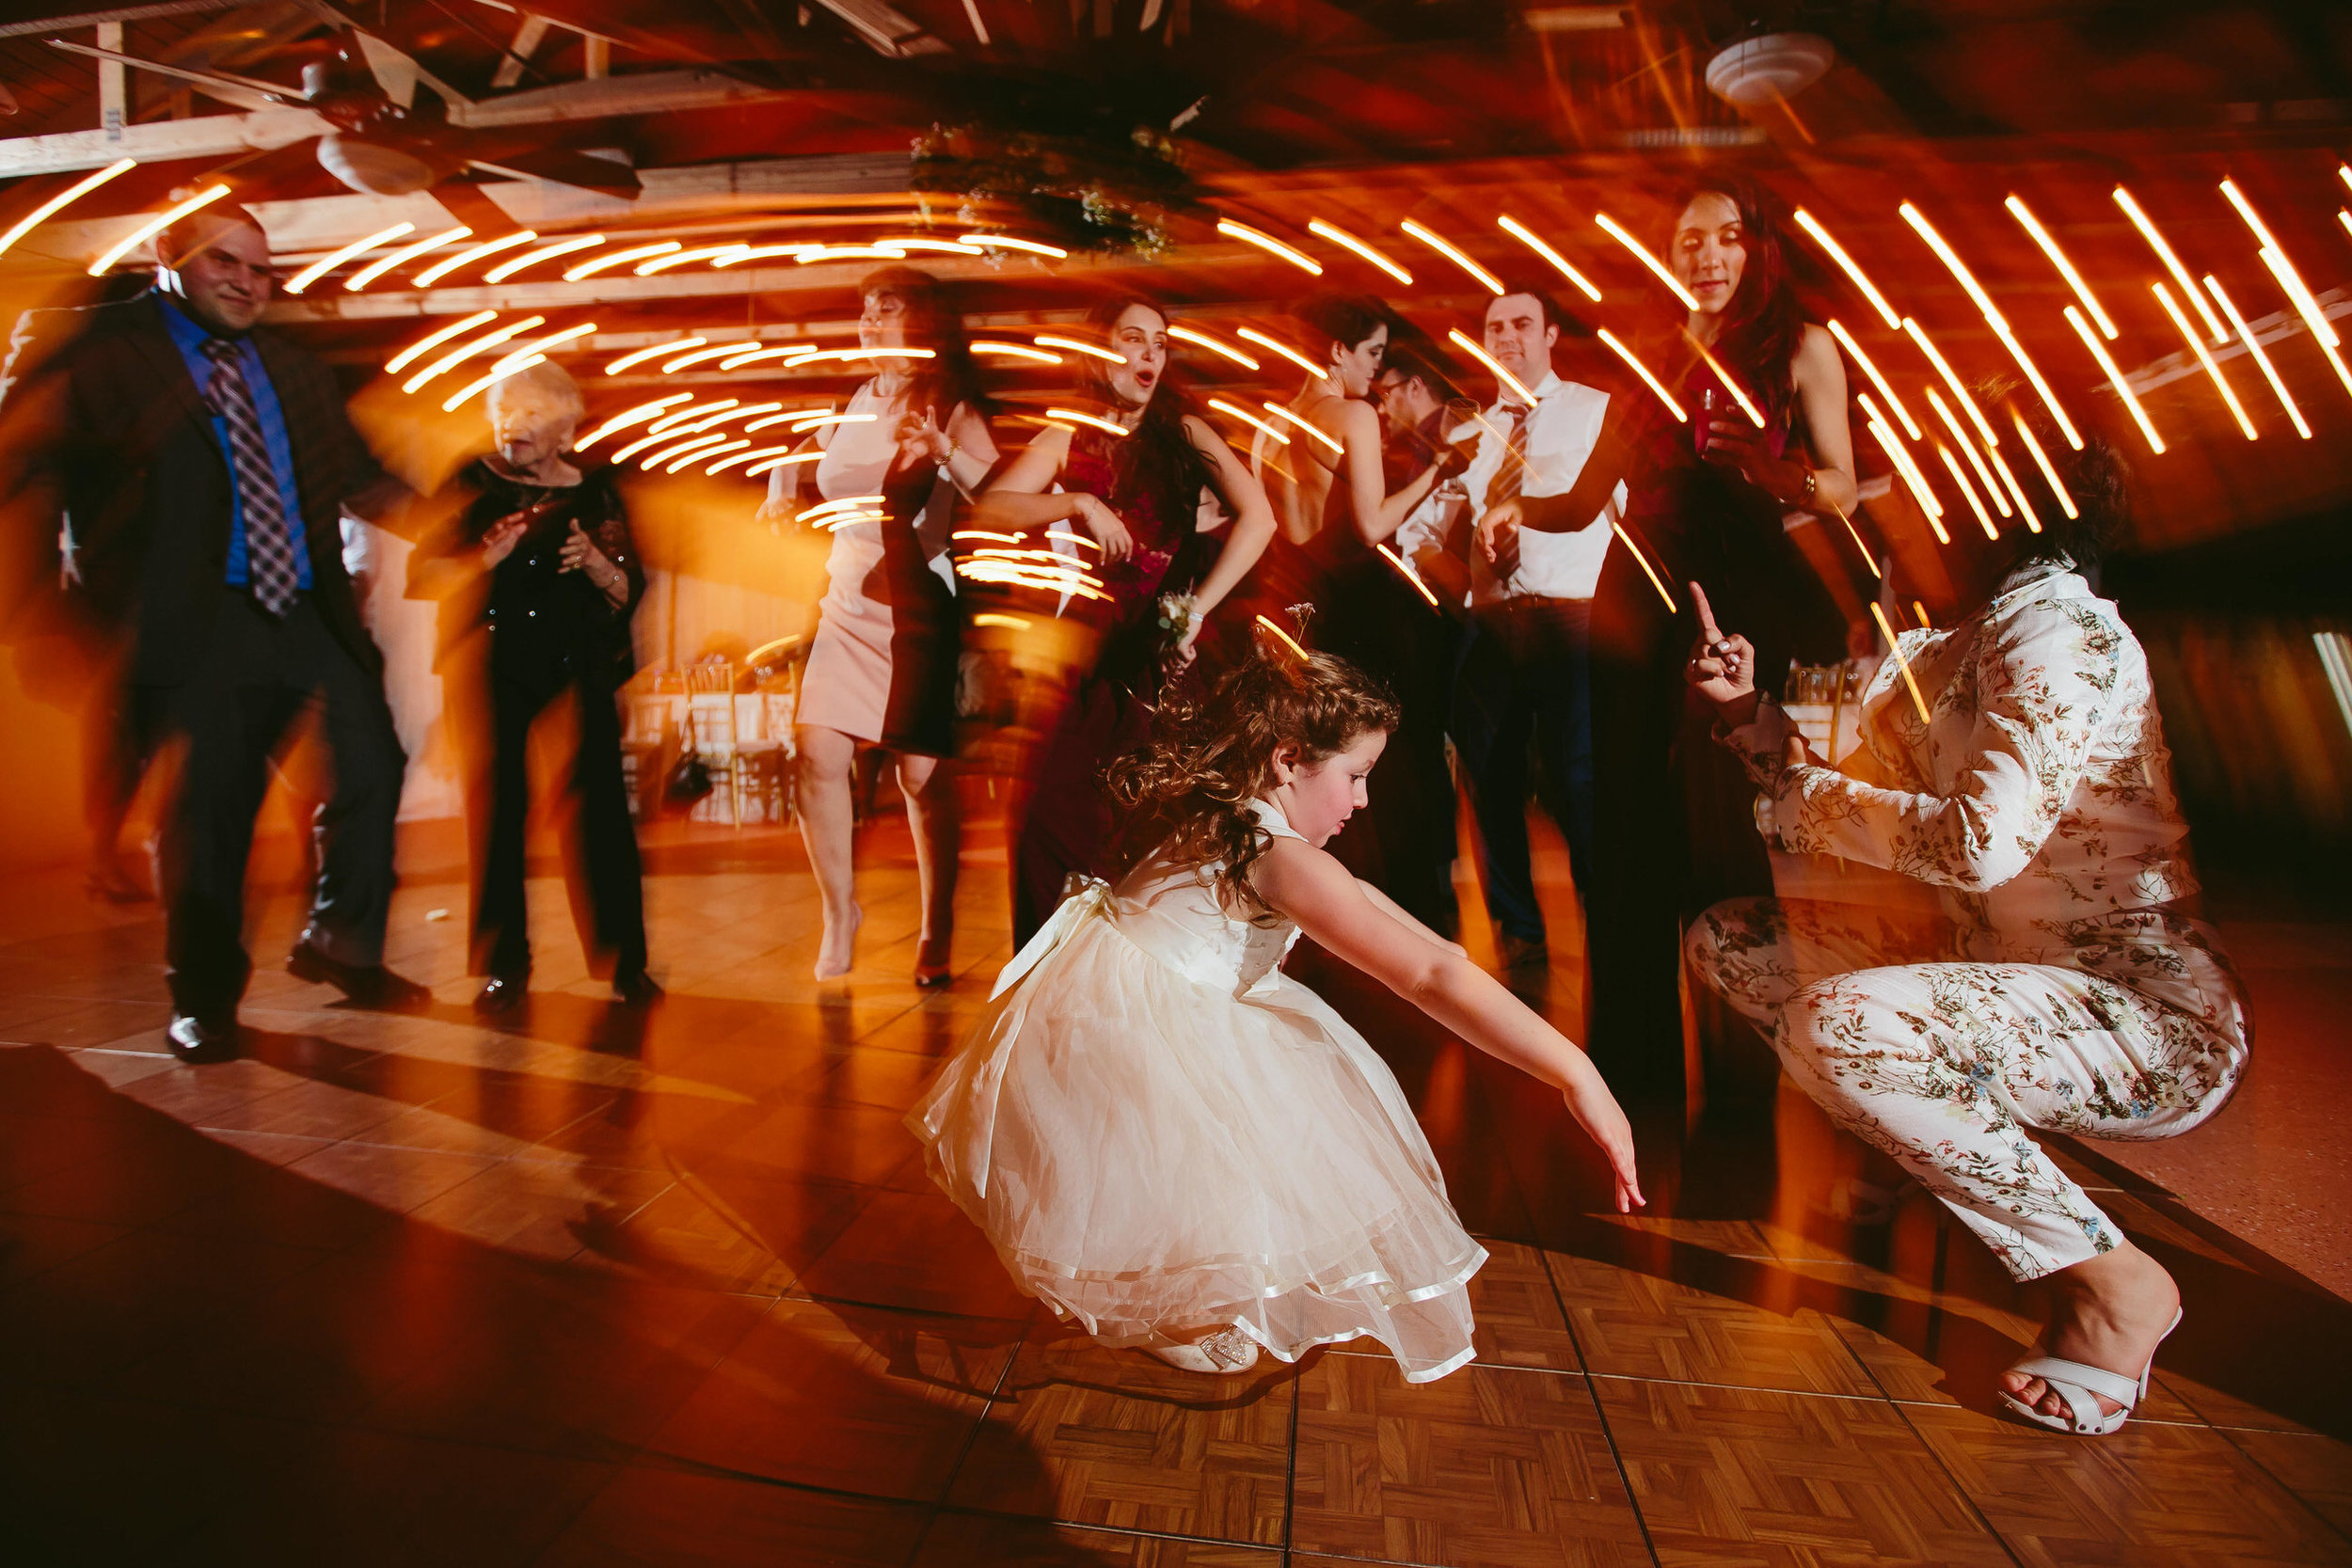 dance-floor-moments-tiny-house-photo-destination-photography.jpg